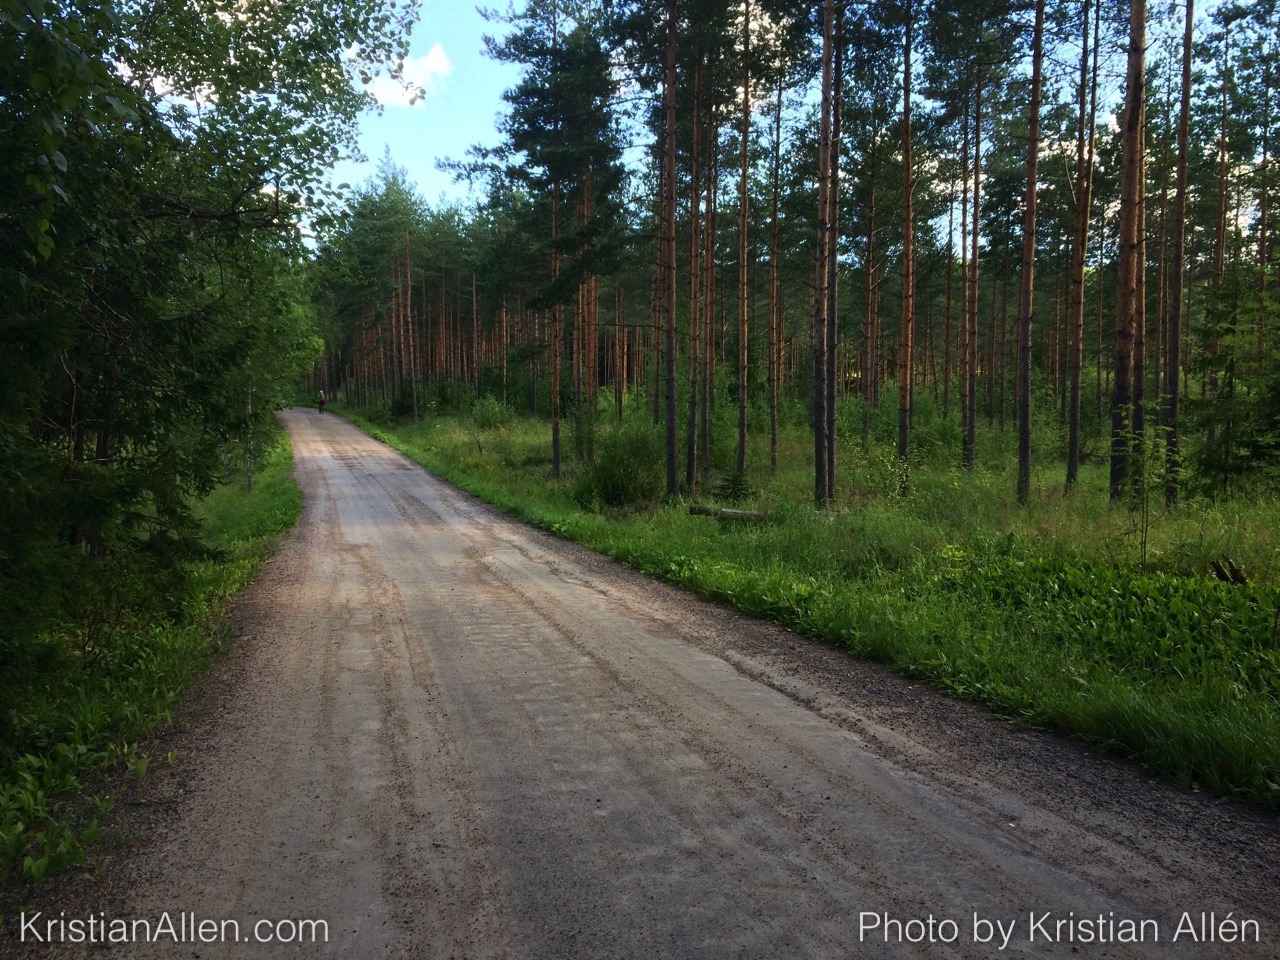 14.7.2016 15.09 km Run